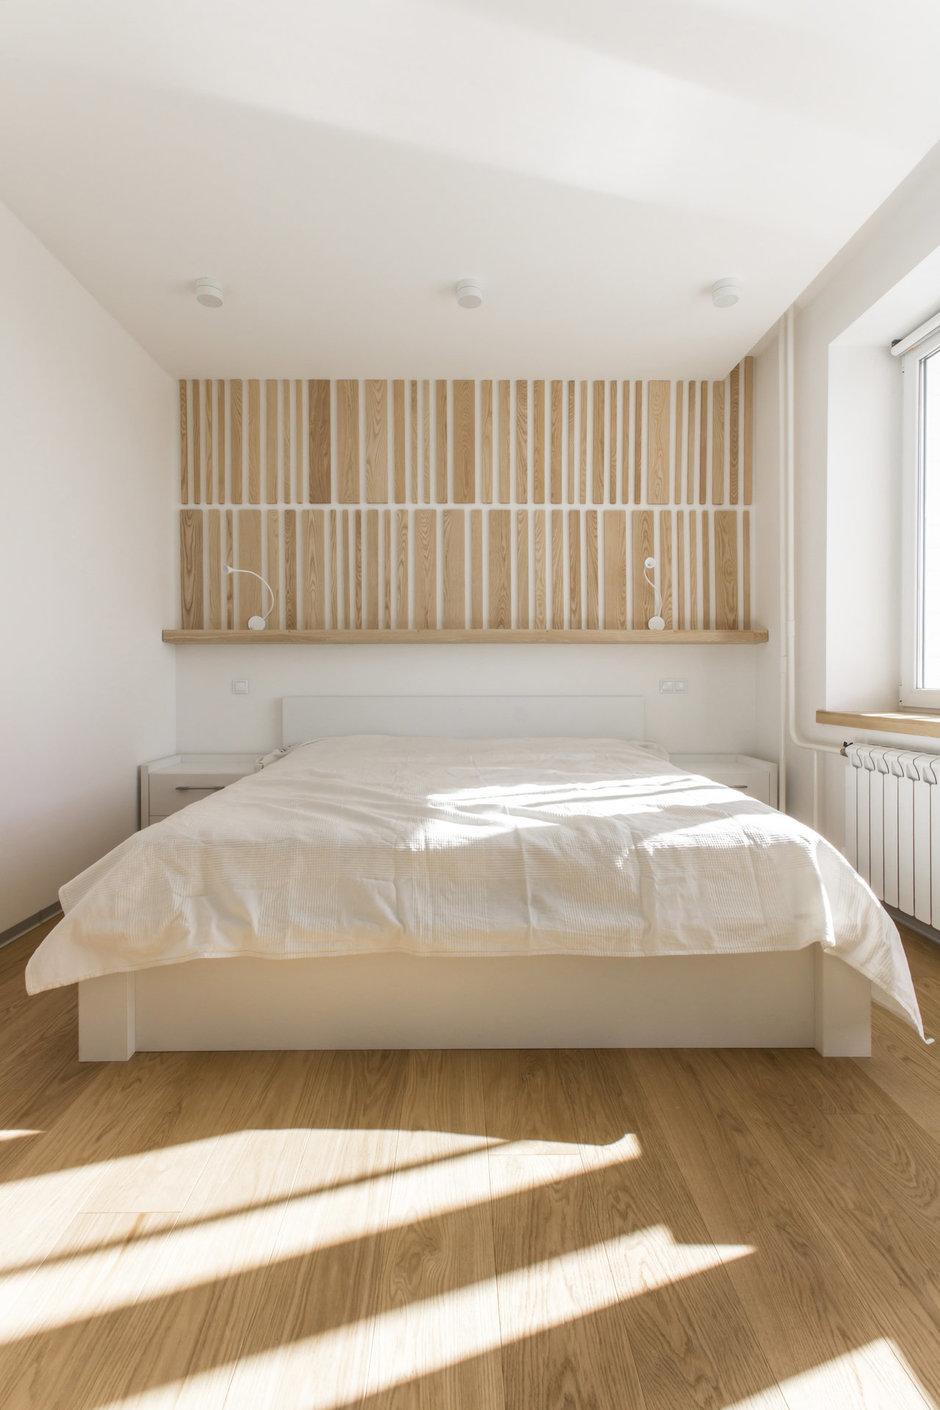 Фотография: Спальня в стиле Лофт, Квартира, BoConcept, Дома и квартиры, Белый, IKEA, Проект недели, Мансарда – фото на InMyRoom.ru